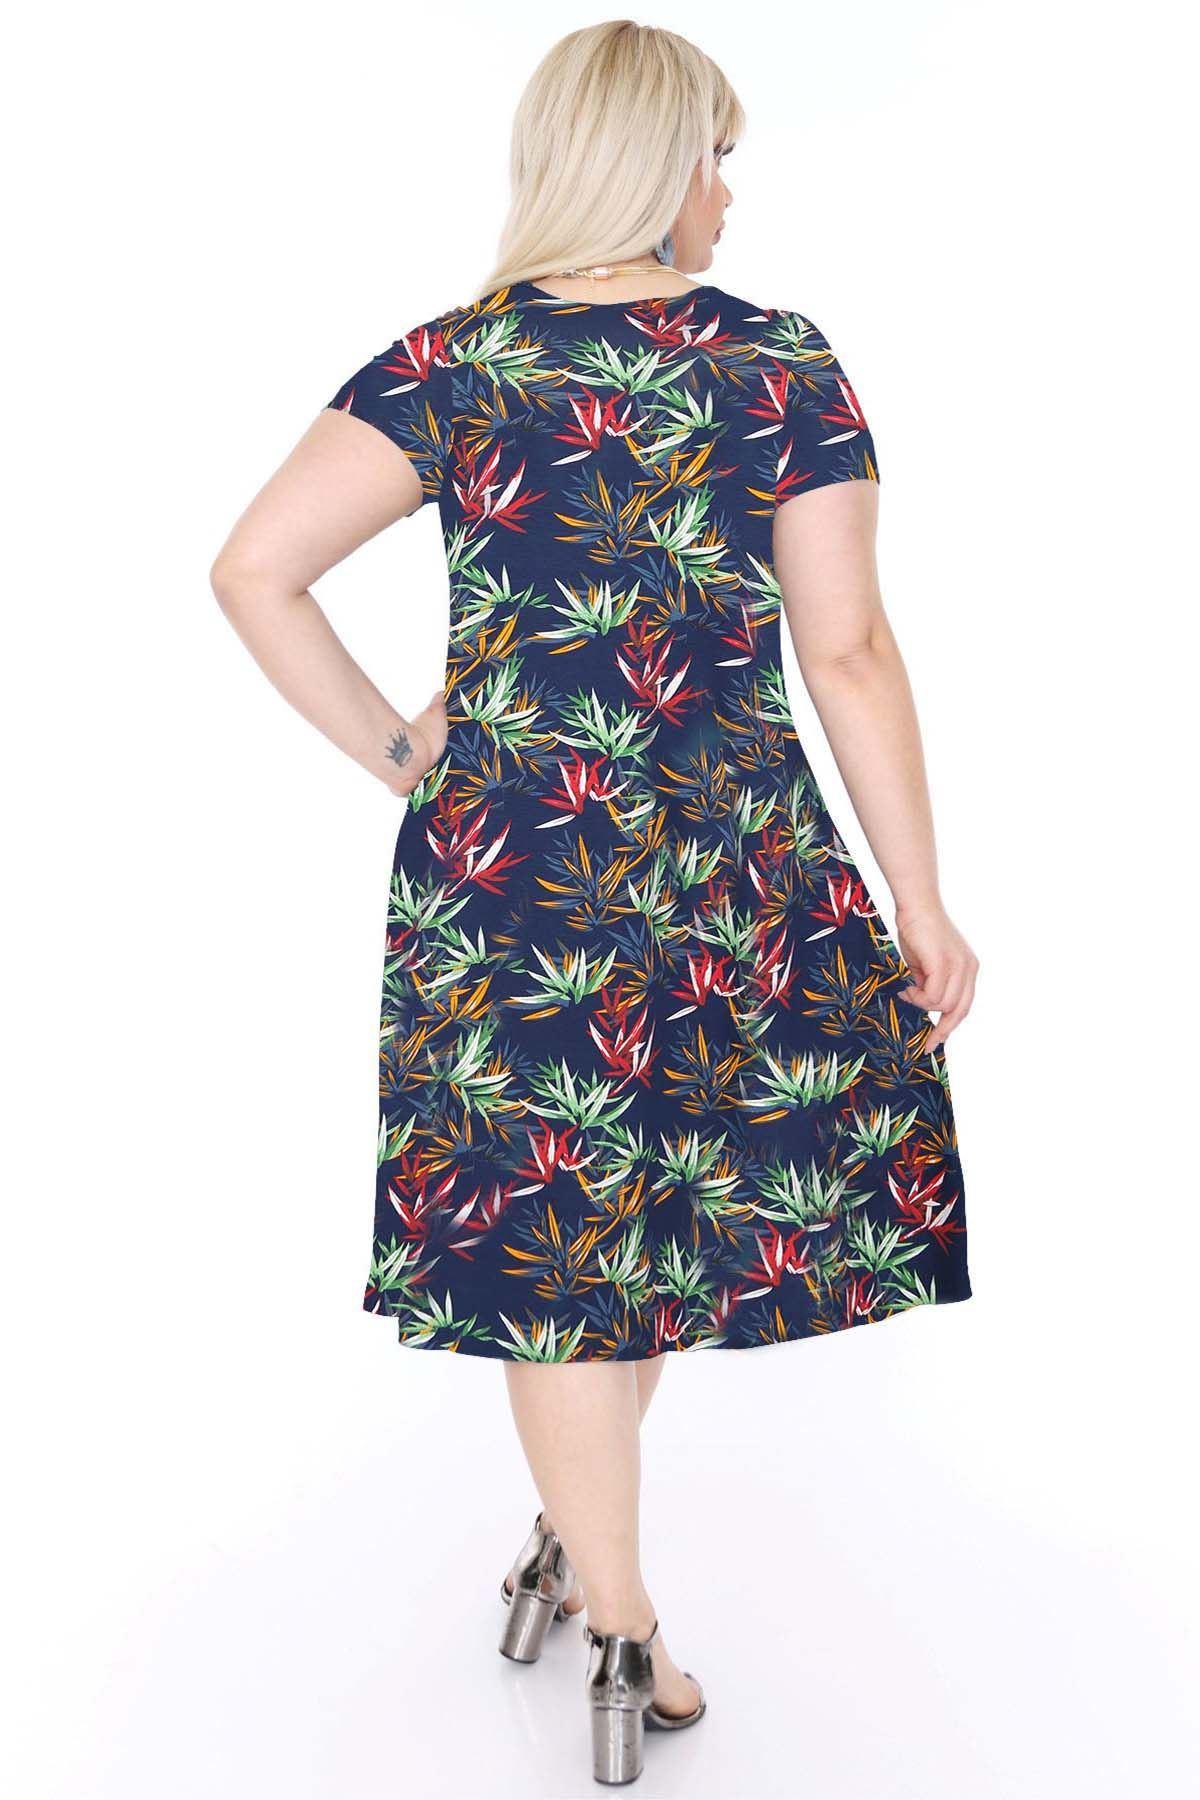 Lacivert Desenli Kloş Model Elbise 2A-0268